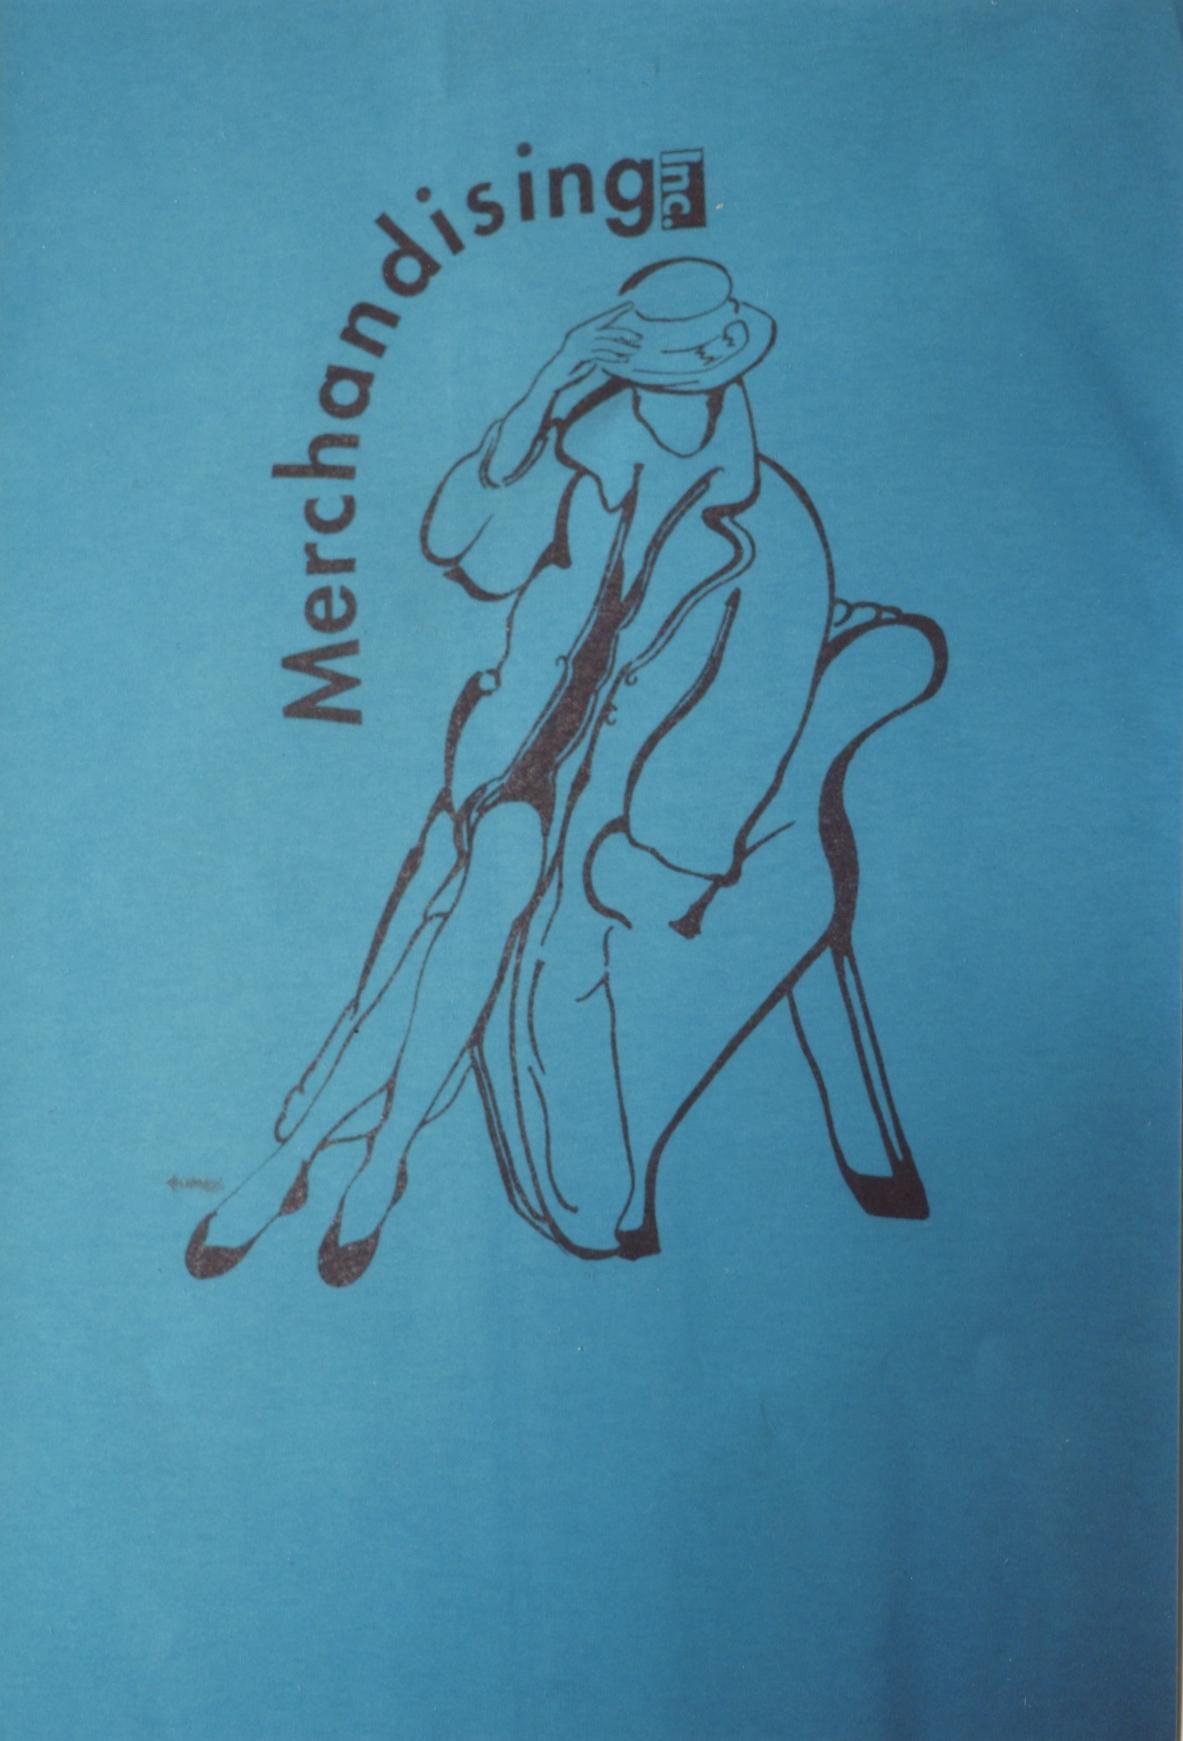 Merchandising Inc.'s Original Logo (Click to enlarge)